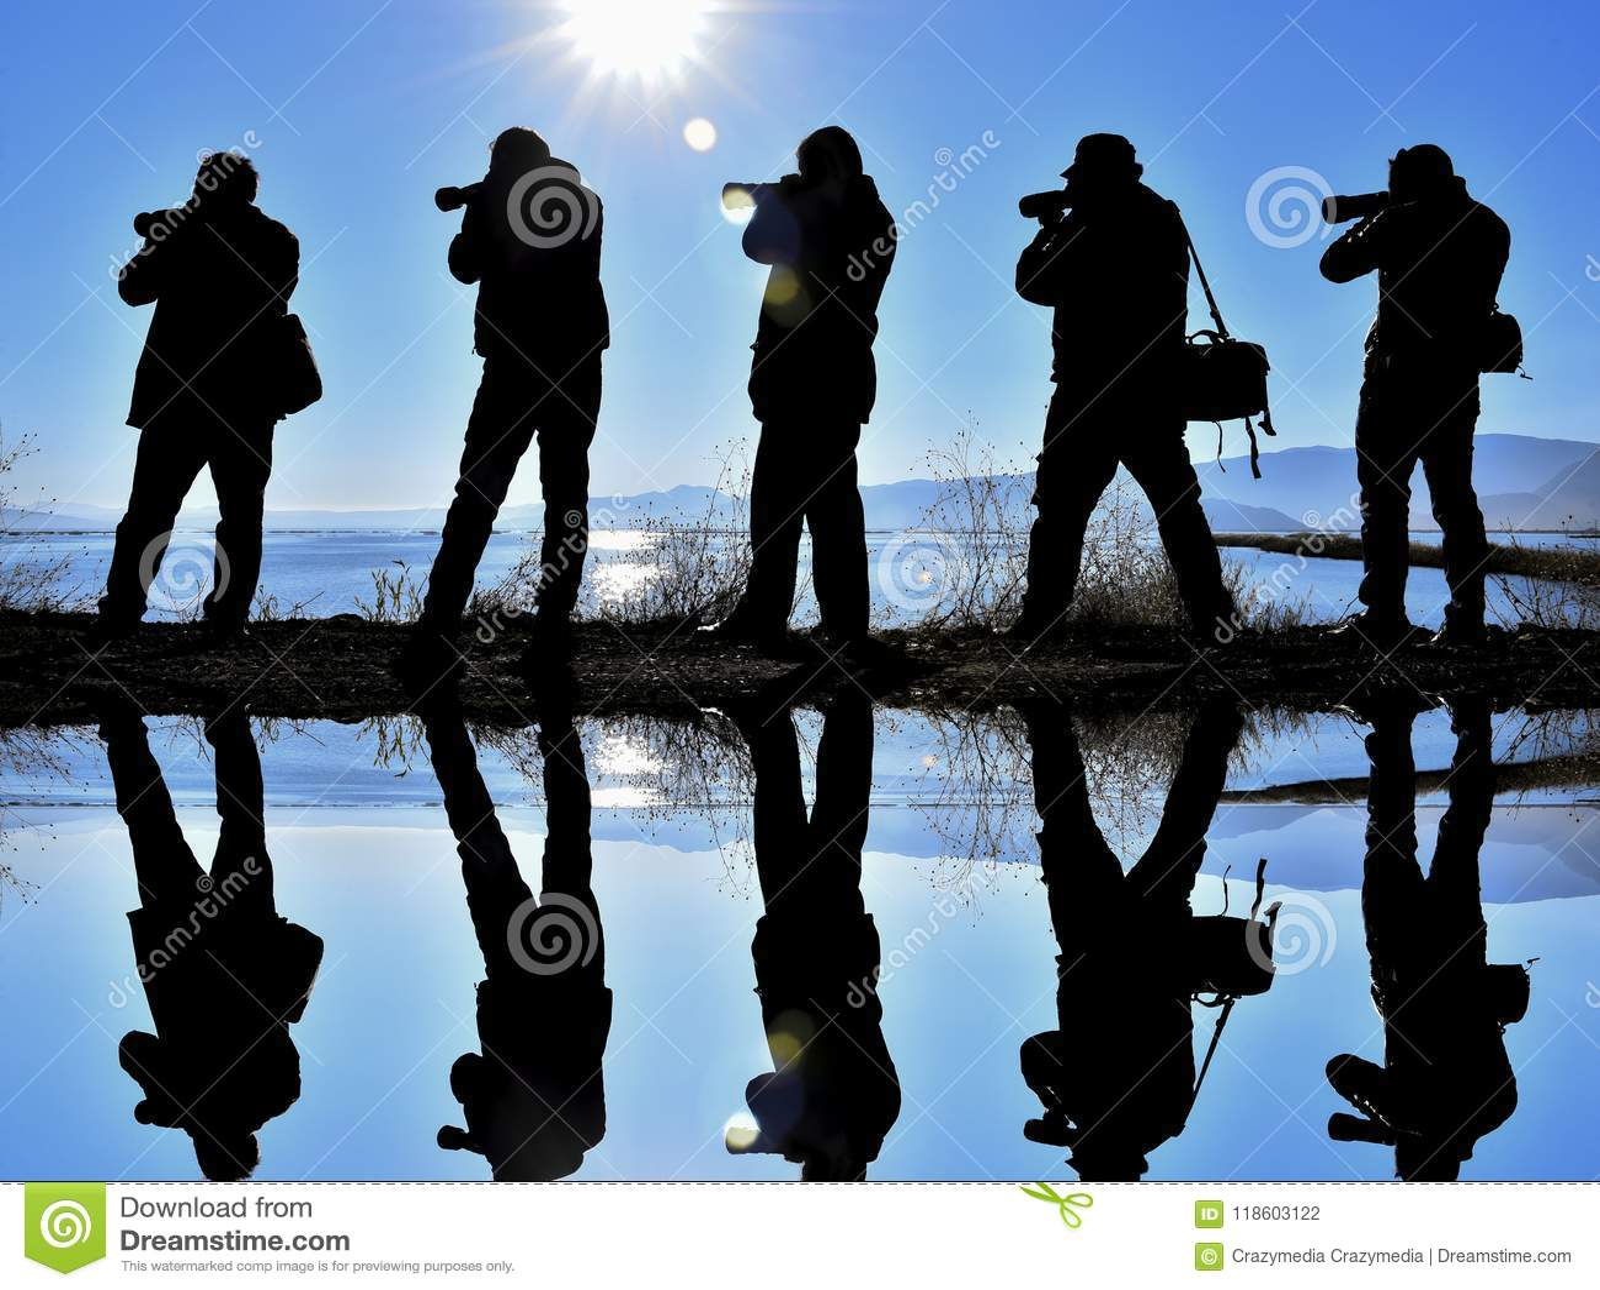 Five photographers beside a lake